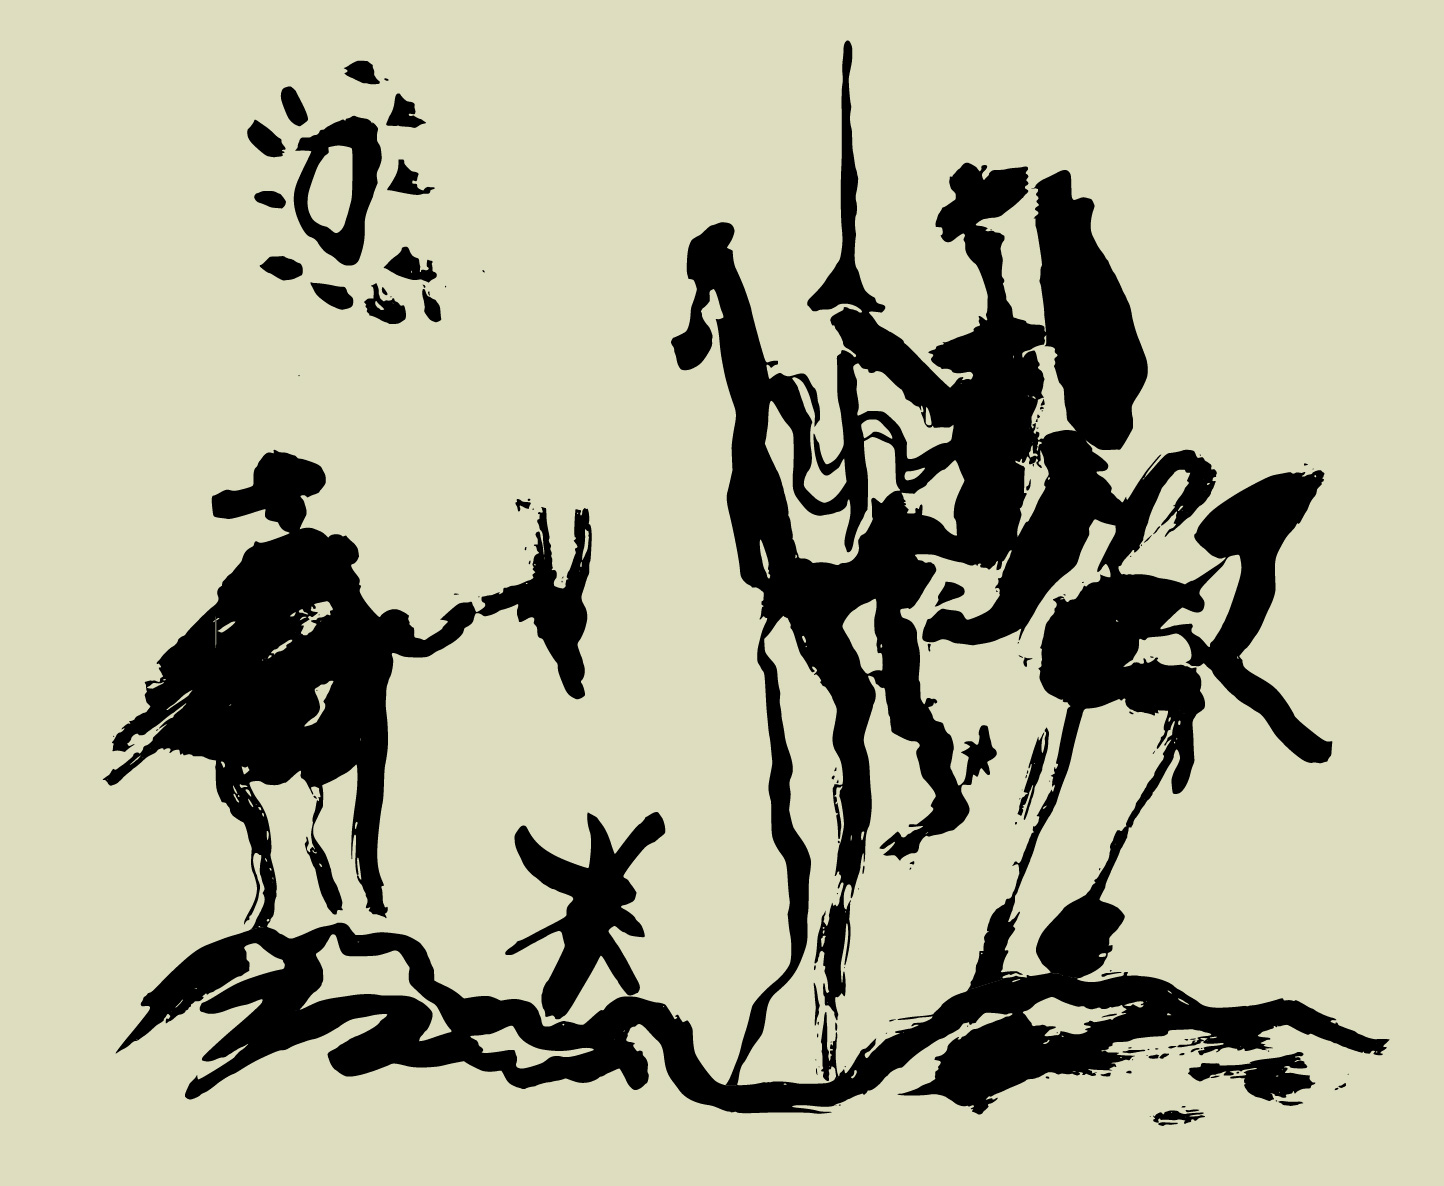 violence desire and the sacred volume 2 rené girard